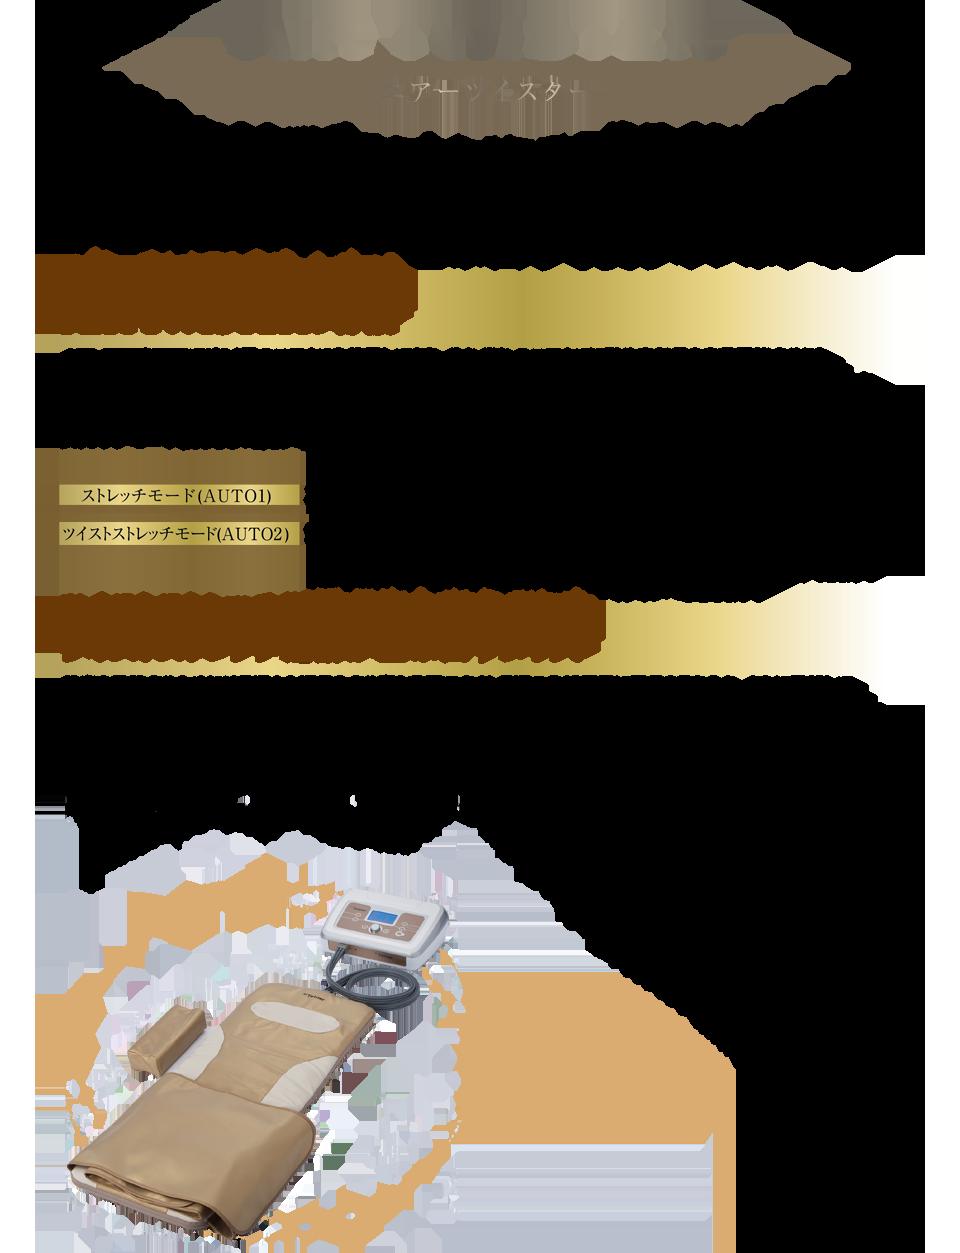 air-professor-triple-system01.png